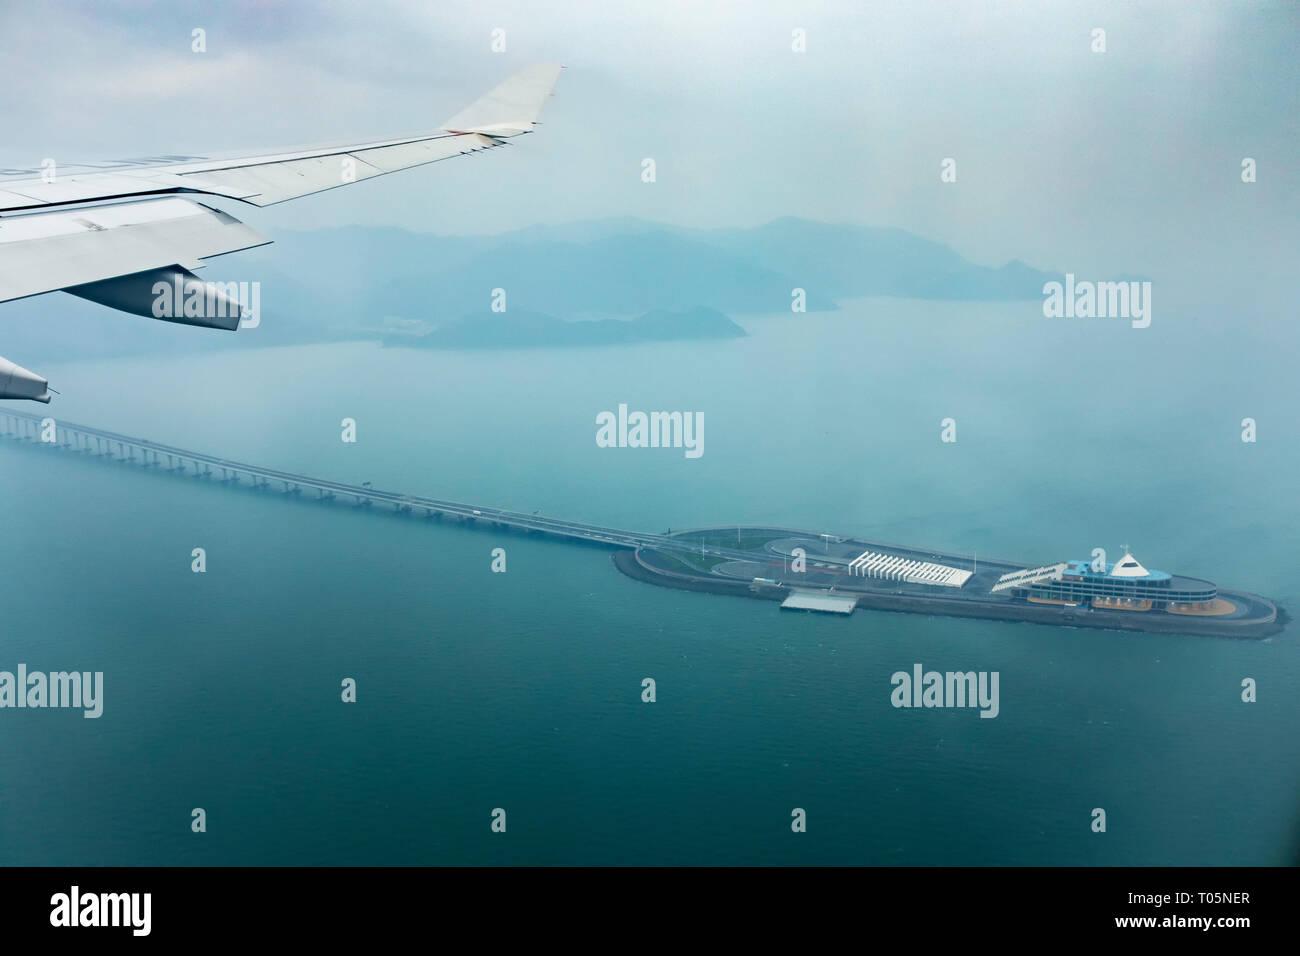 aerial view from plane window of hong kong - juhai - macau bridge crossing ocean harbor Stock Photo